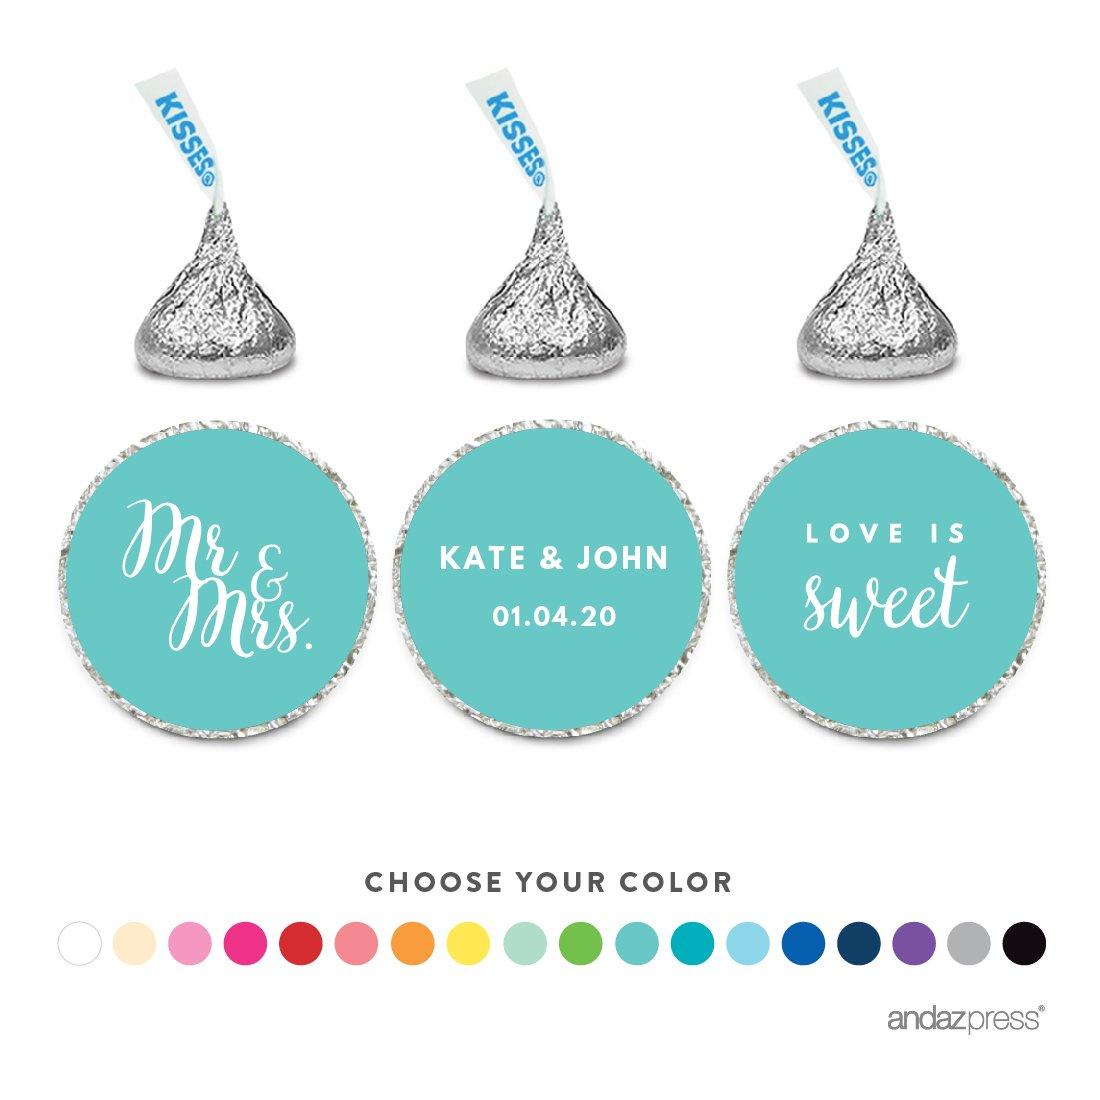 Amazon.com: Andaz Press Personalized Chocolate Drop Labels Trio ...